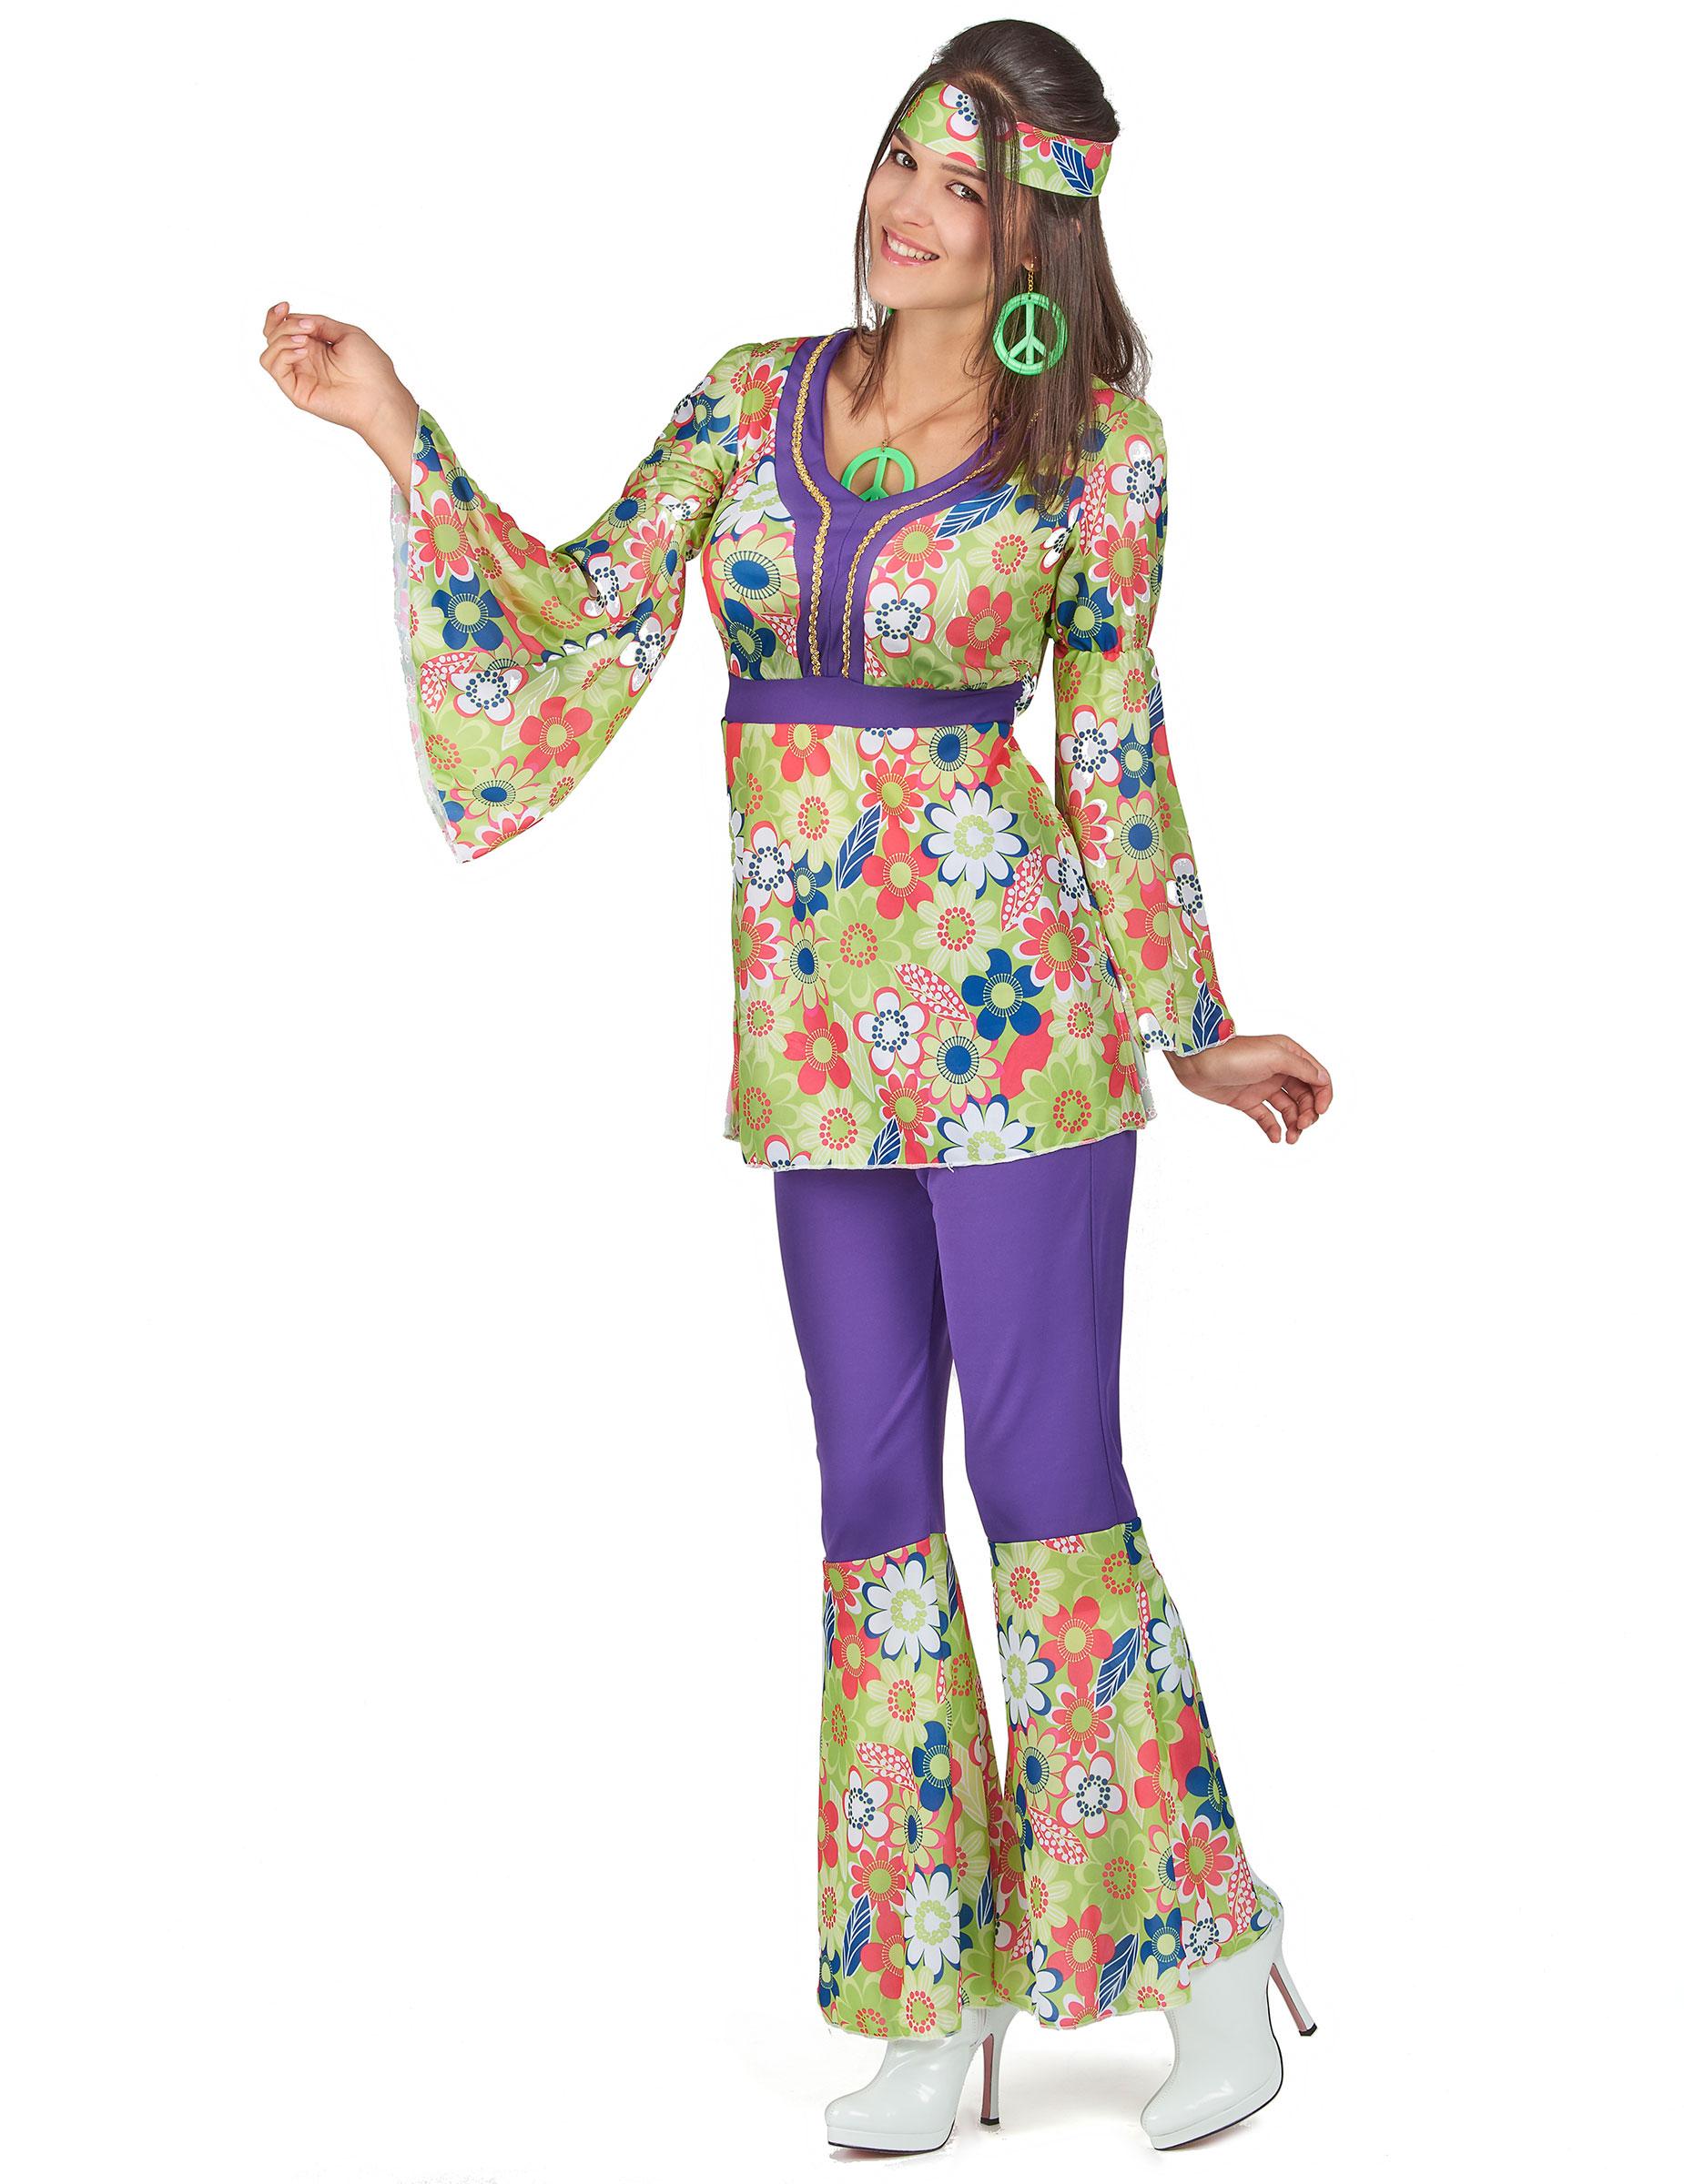 Costume hippy donna Costumi adultie vestiti di carnevale online - Vegaoo